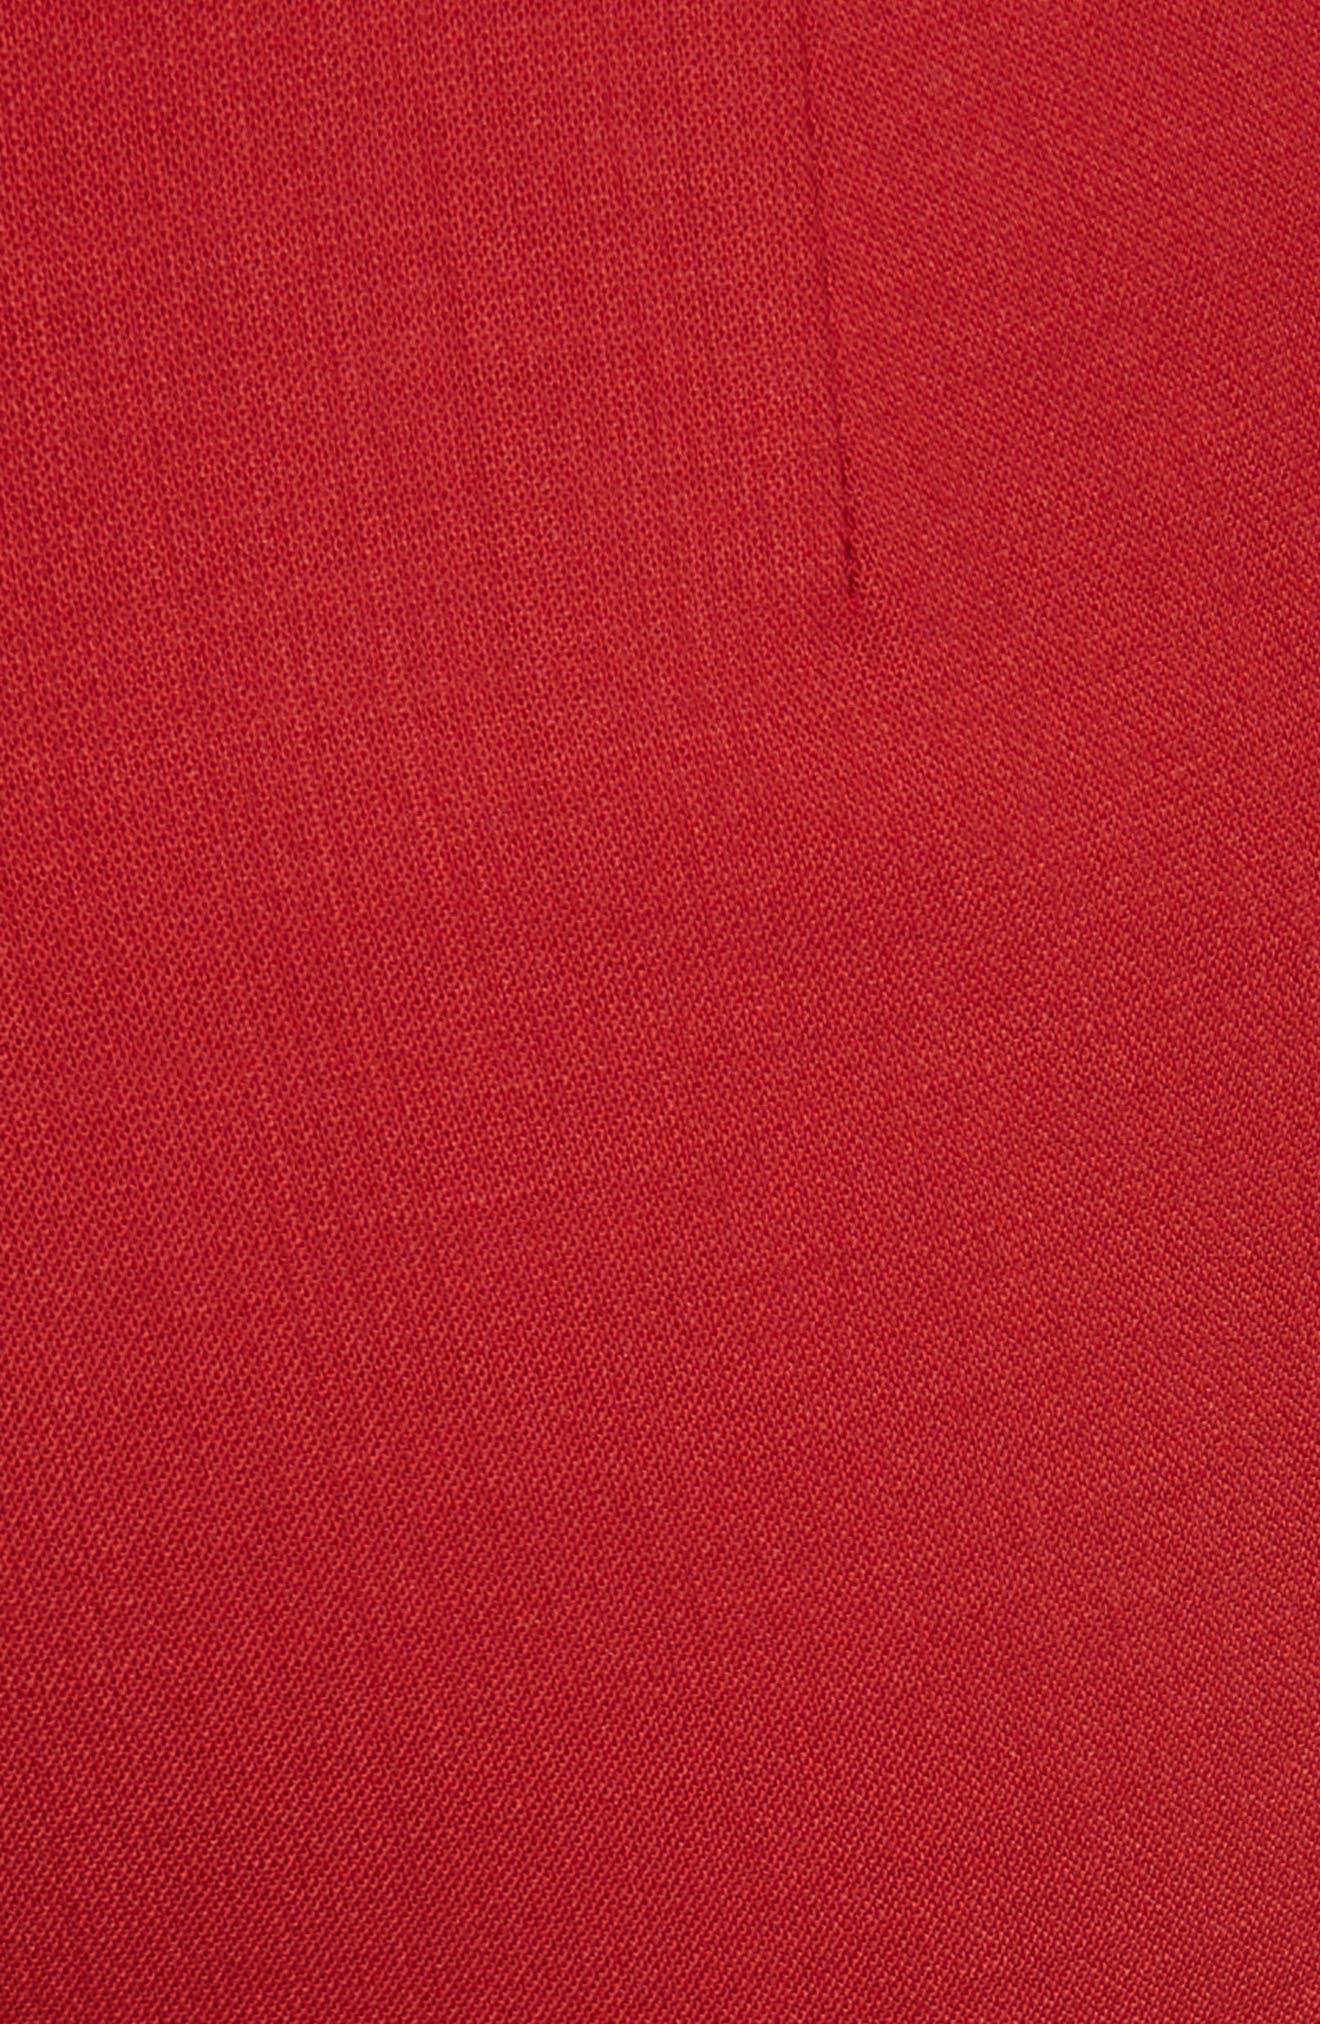 MAX MARA, Oscuro Stretch Wool Pants, Alternate thumbnail 5, color, 614